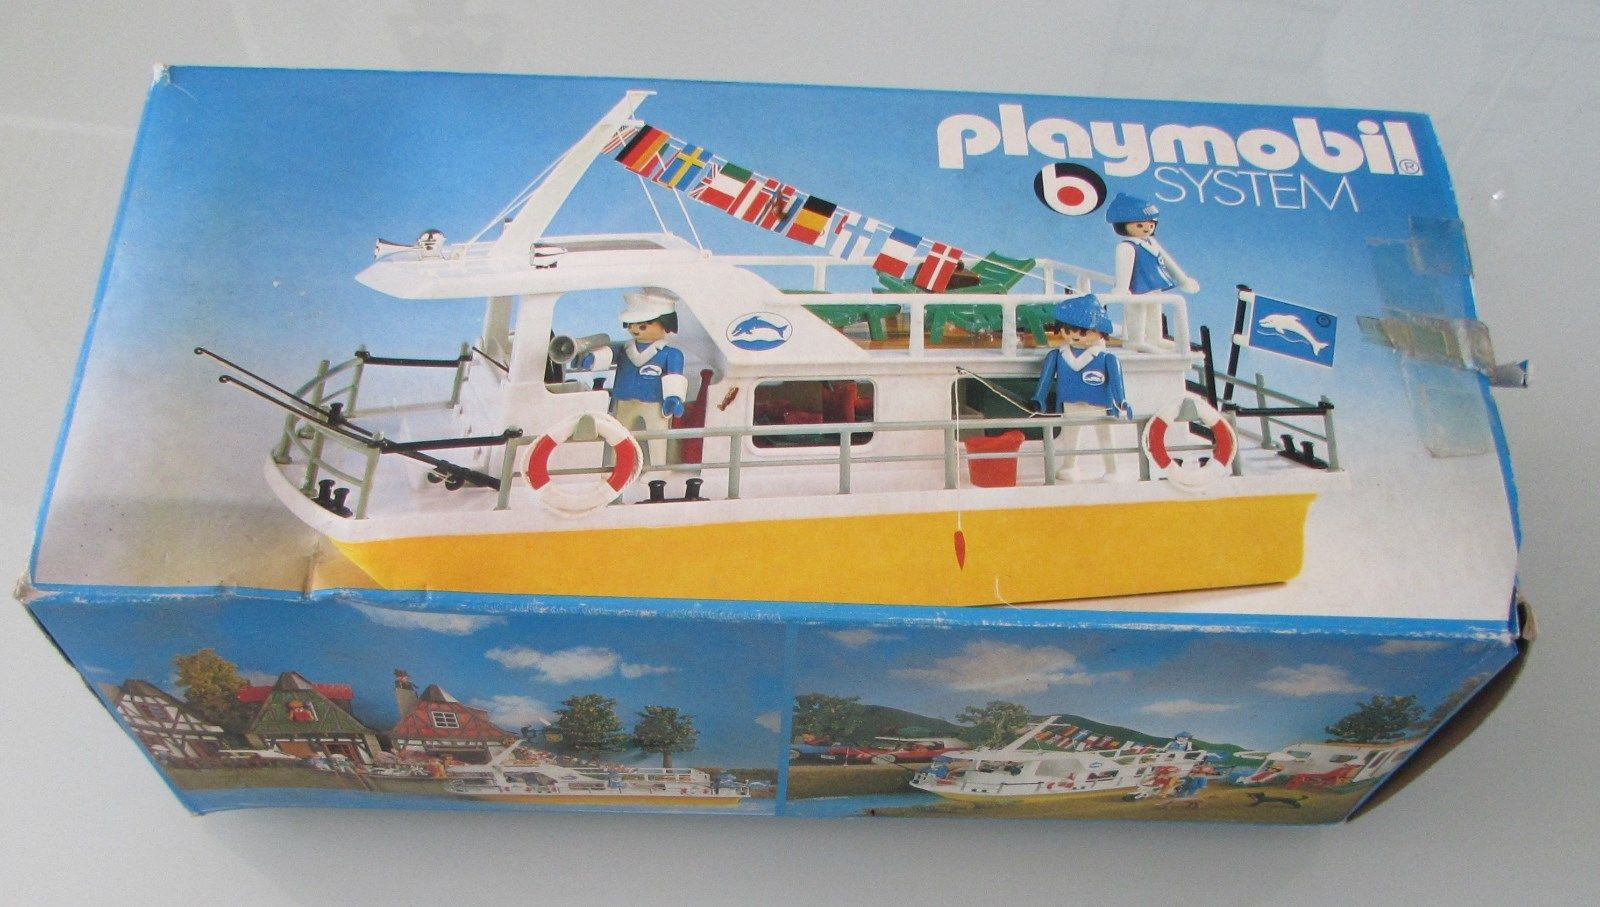 Playmobil bateau plaisance